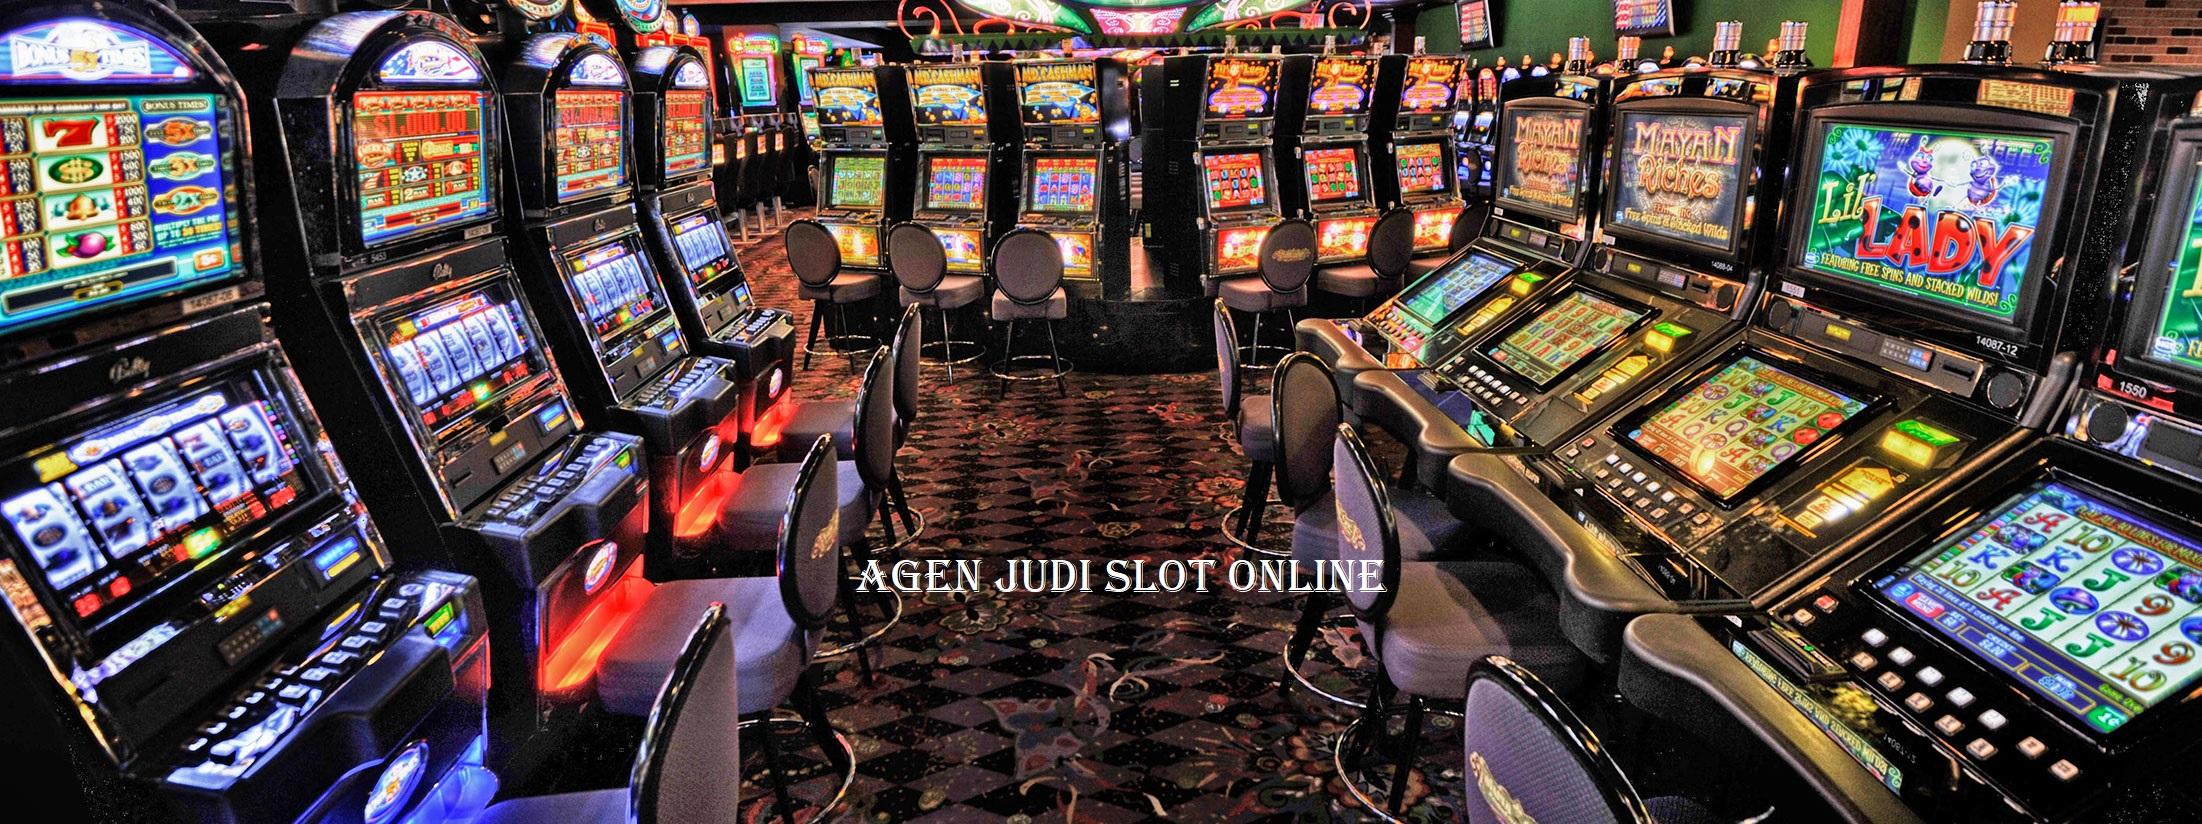 Agen Judi Slot Mesin Online